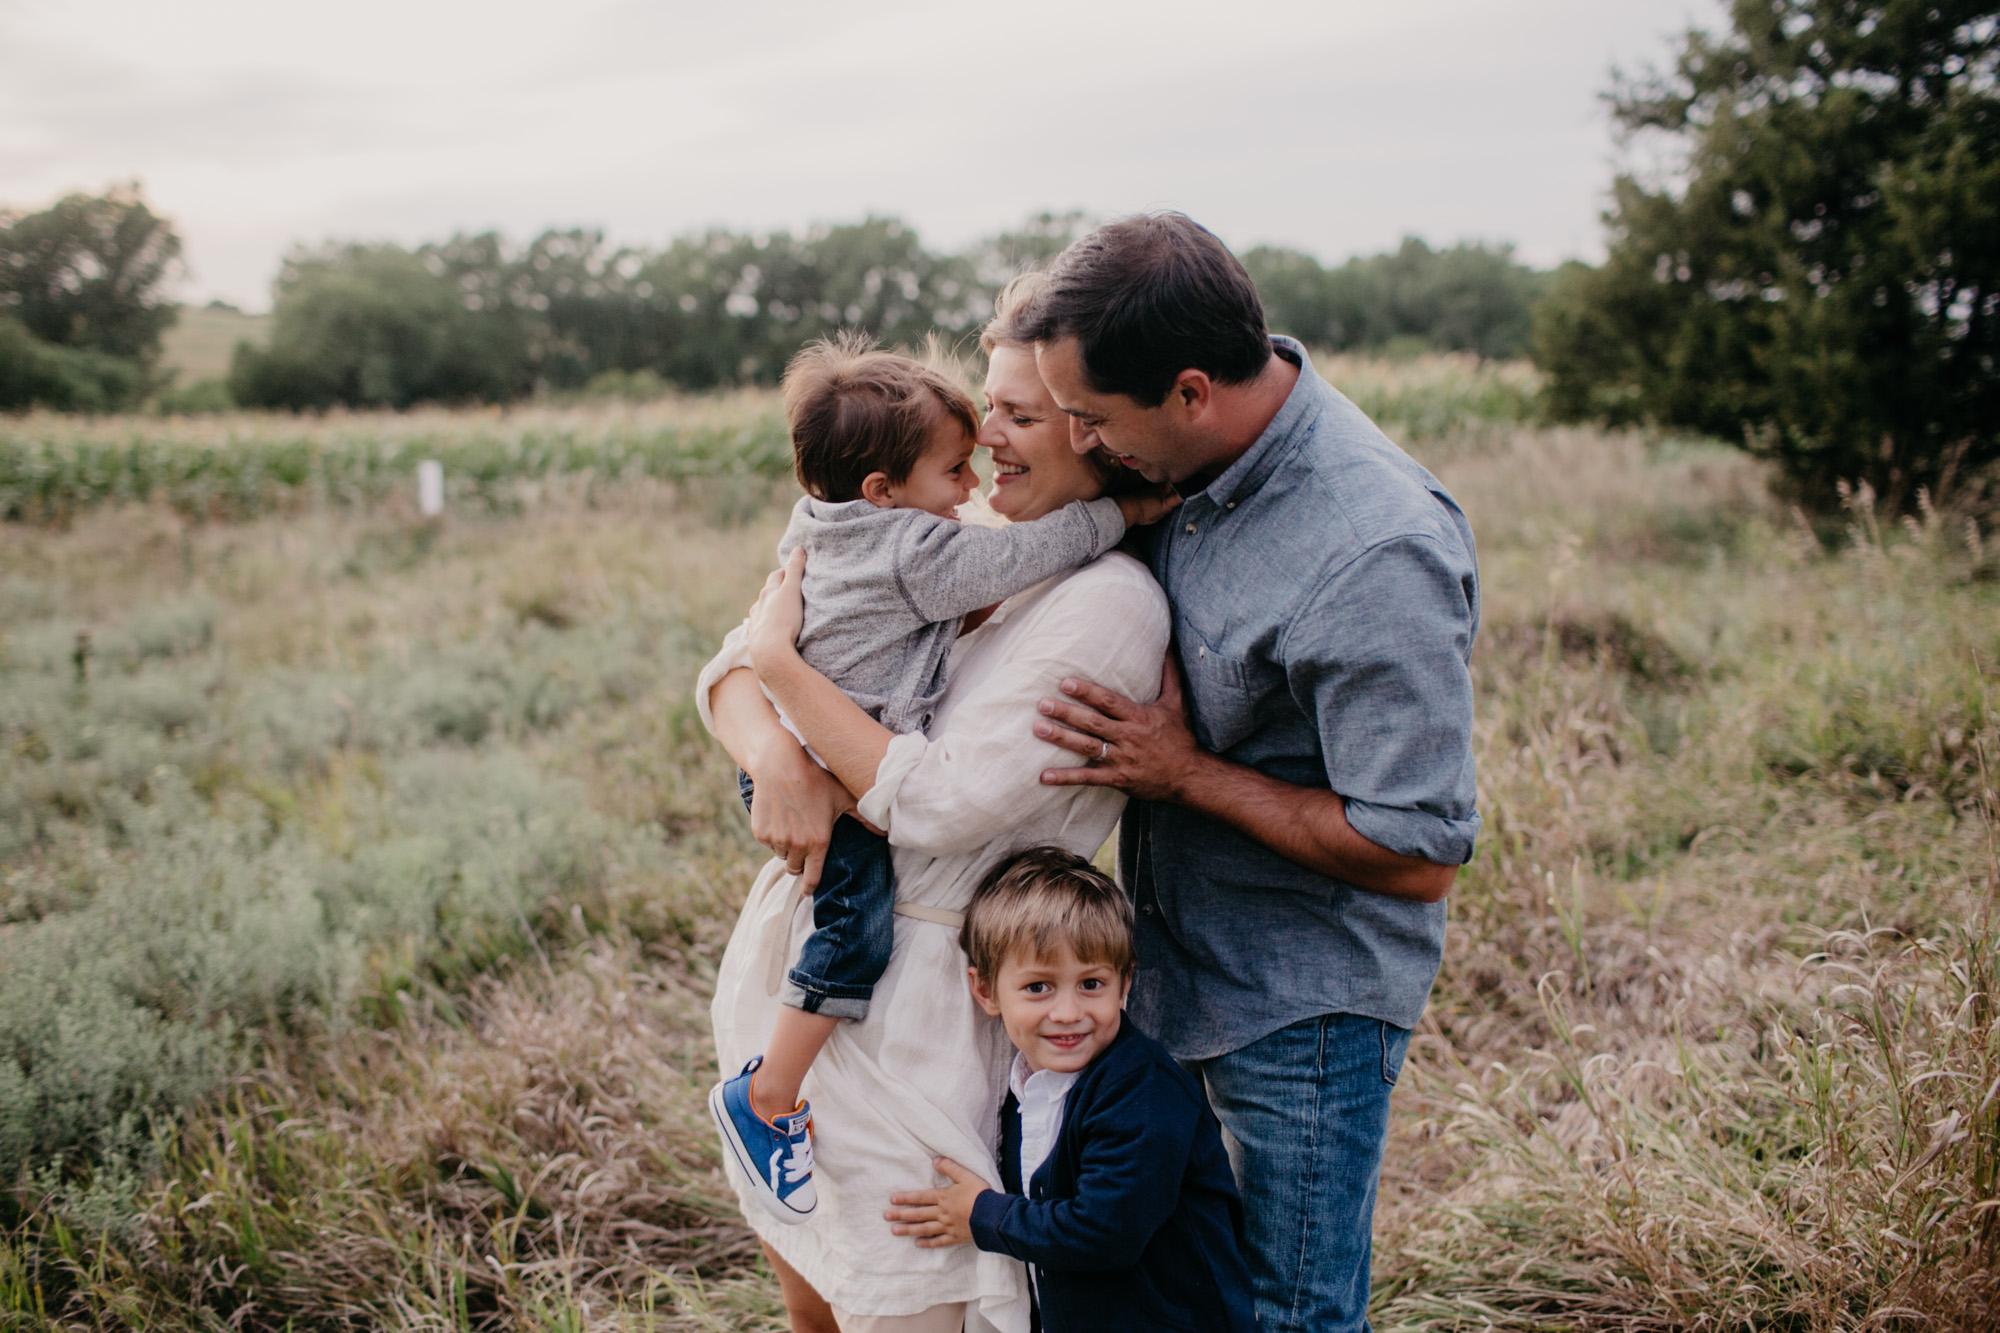 omaha-family-photographer-burks-10.jpg